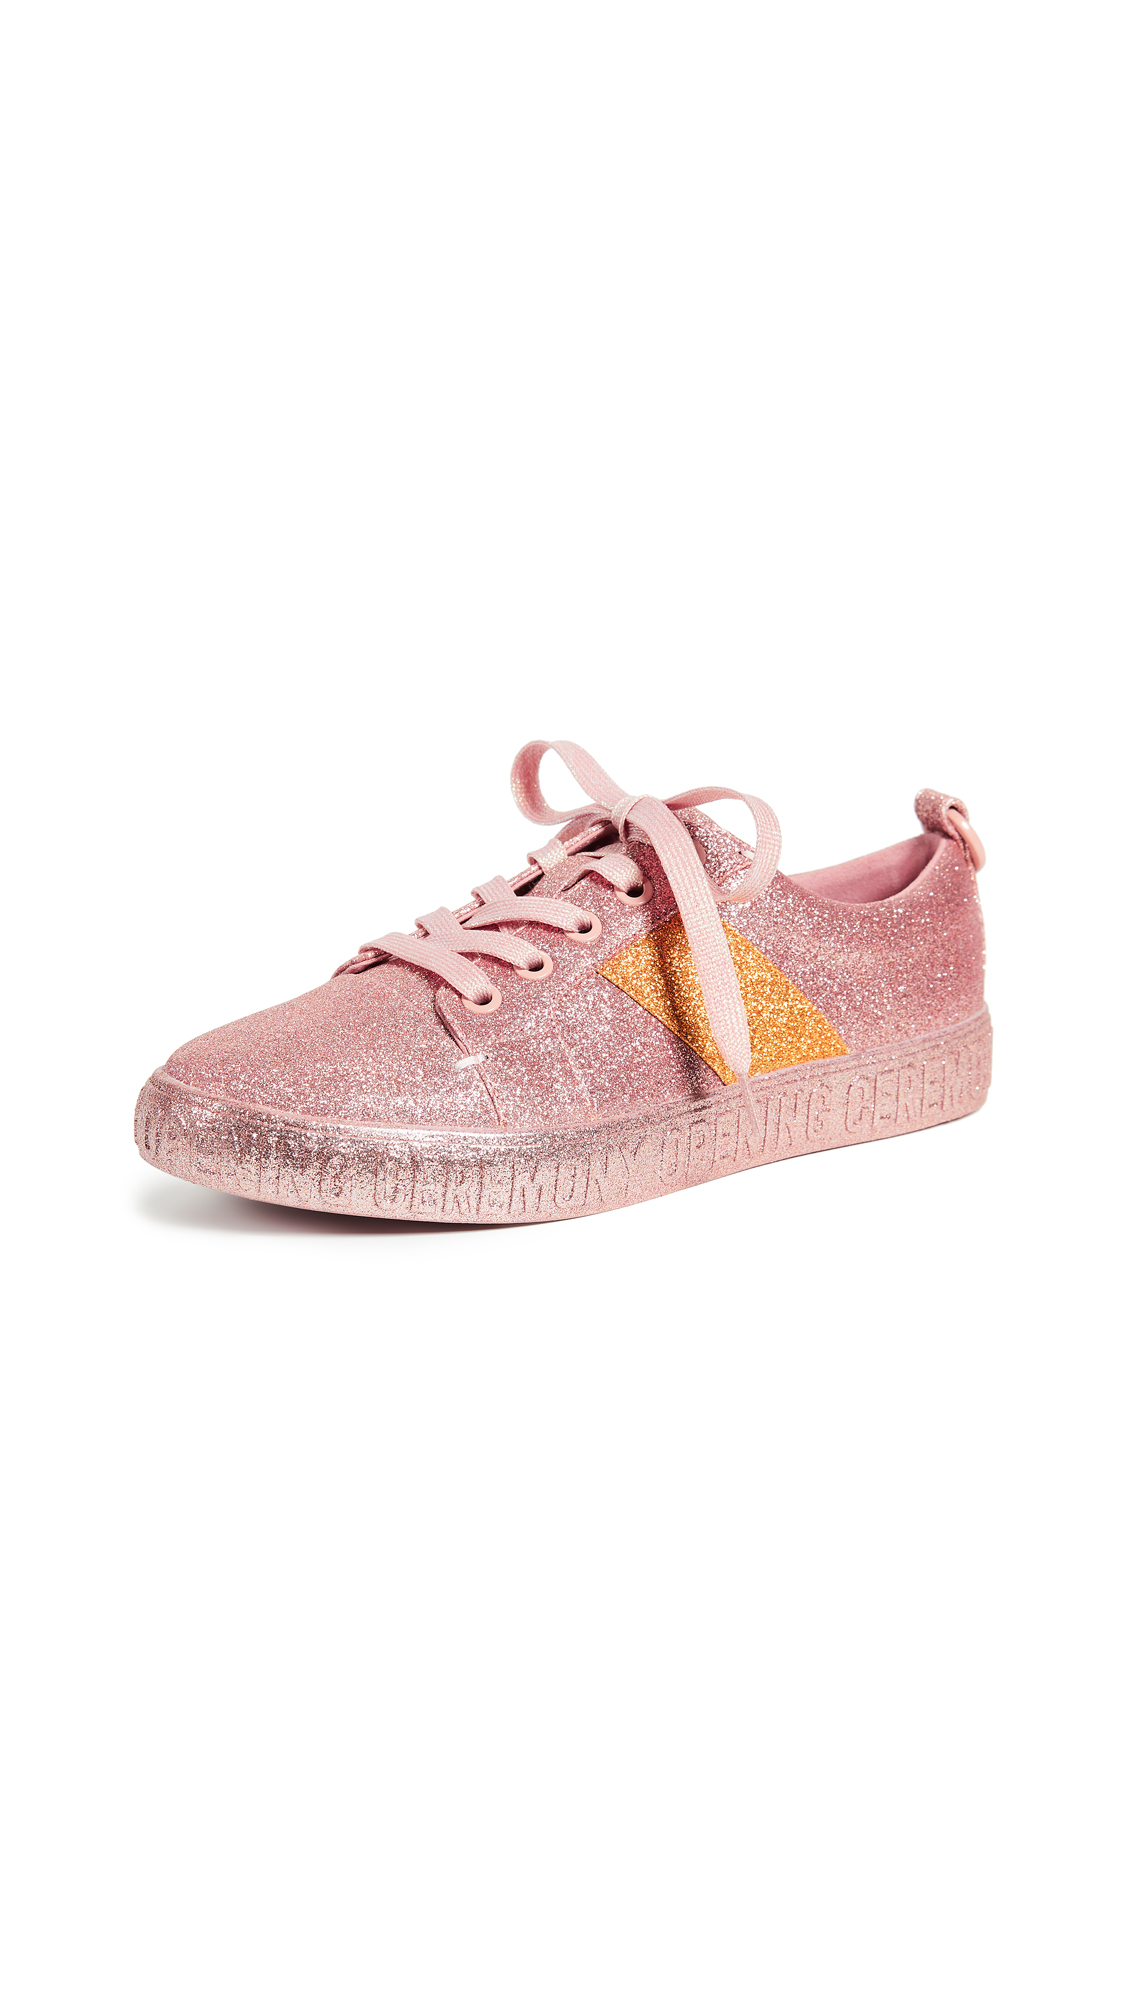 Opening Ceremony La Cienega Glitter Sneakers - Pink